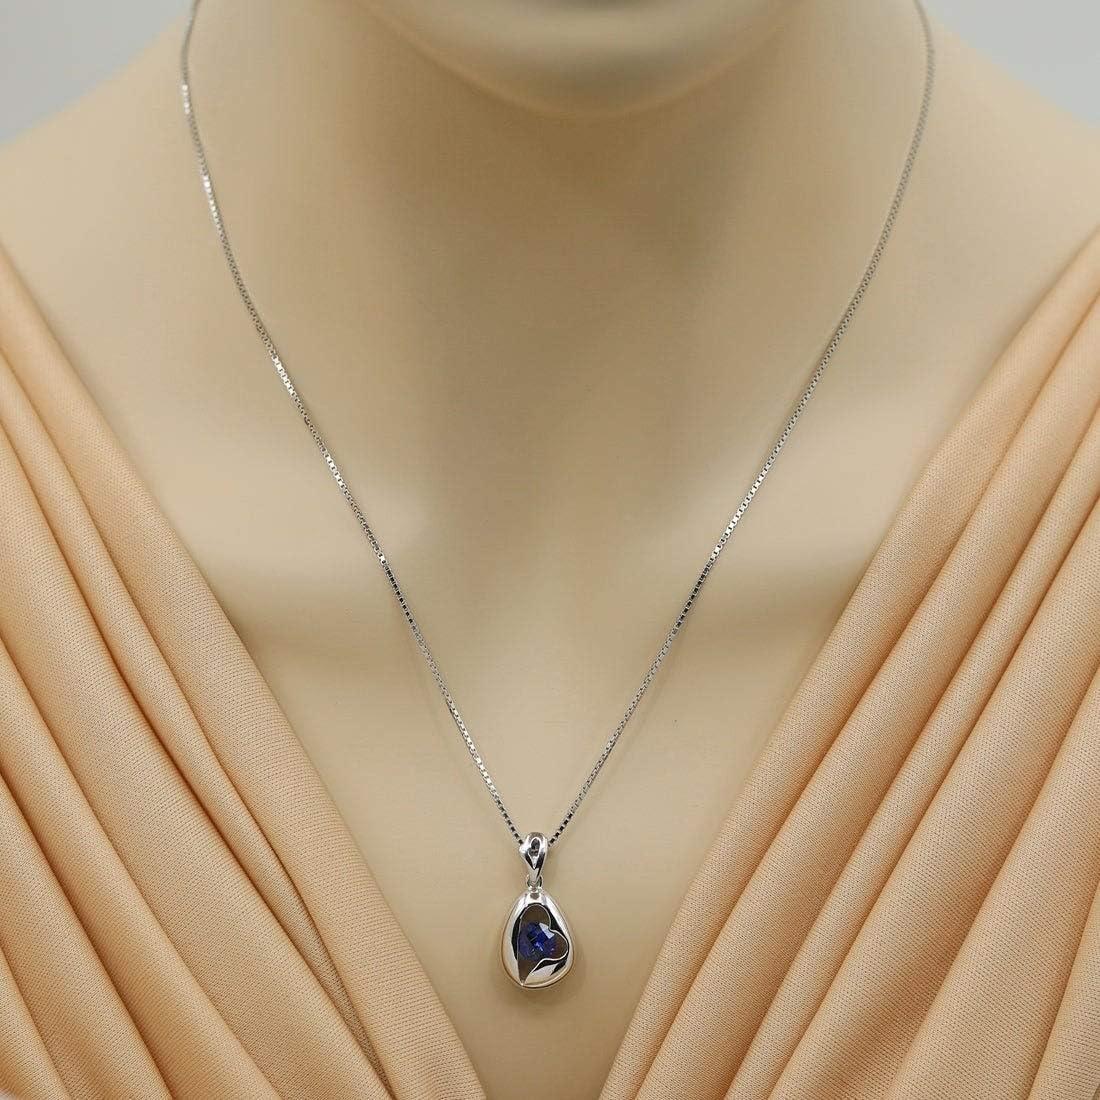 1.15Ctw Round Cut Blue Sapphire Sim Diamond Manimalist Women Pendant Necklace14K White Gold Finish